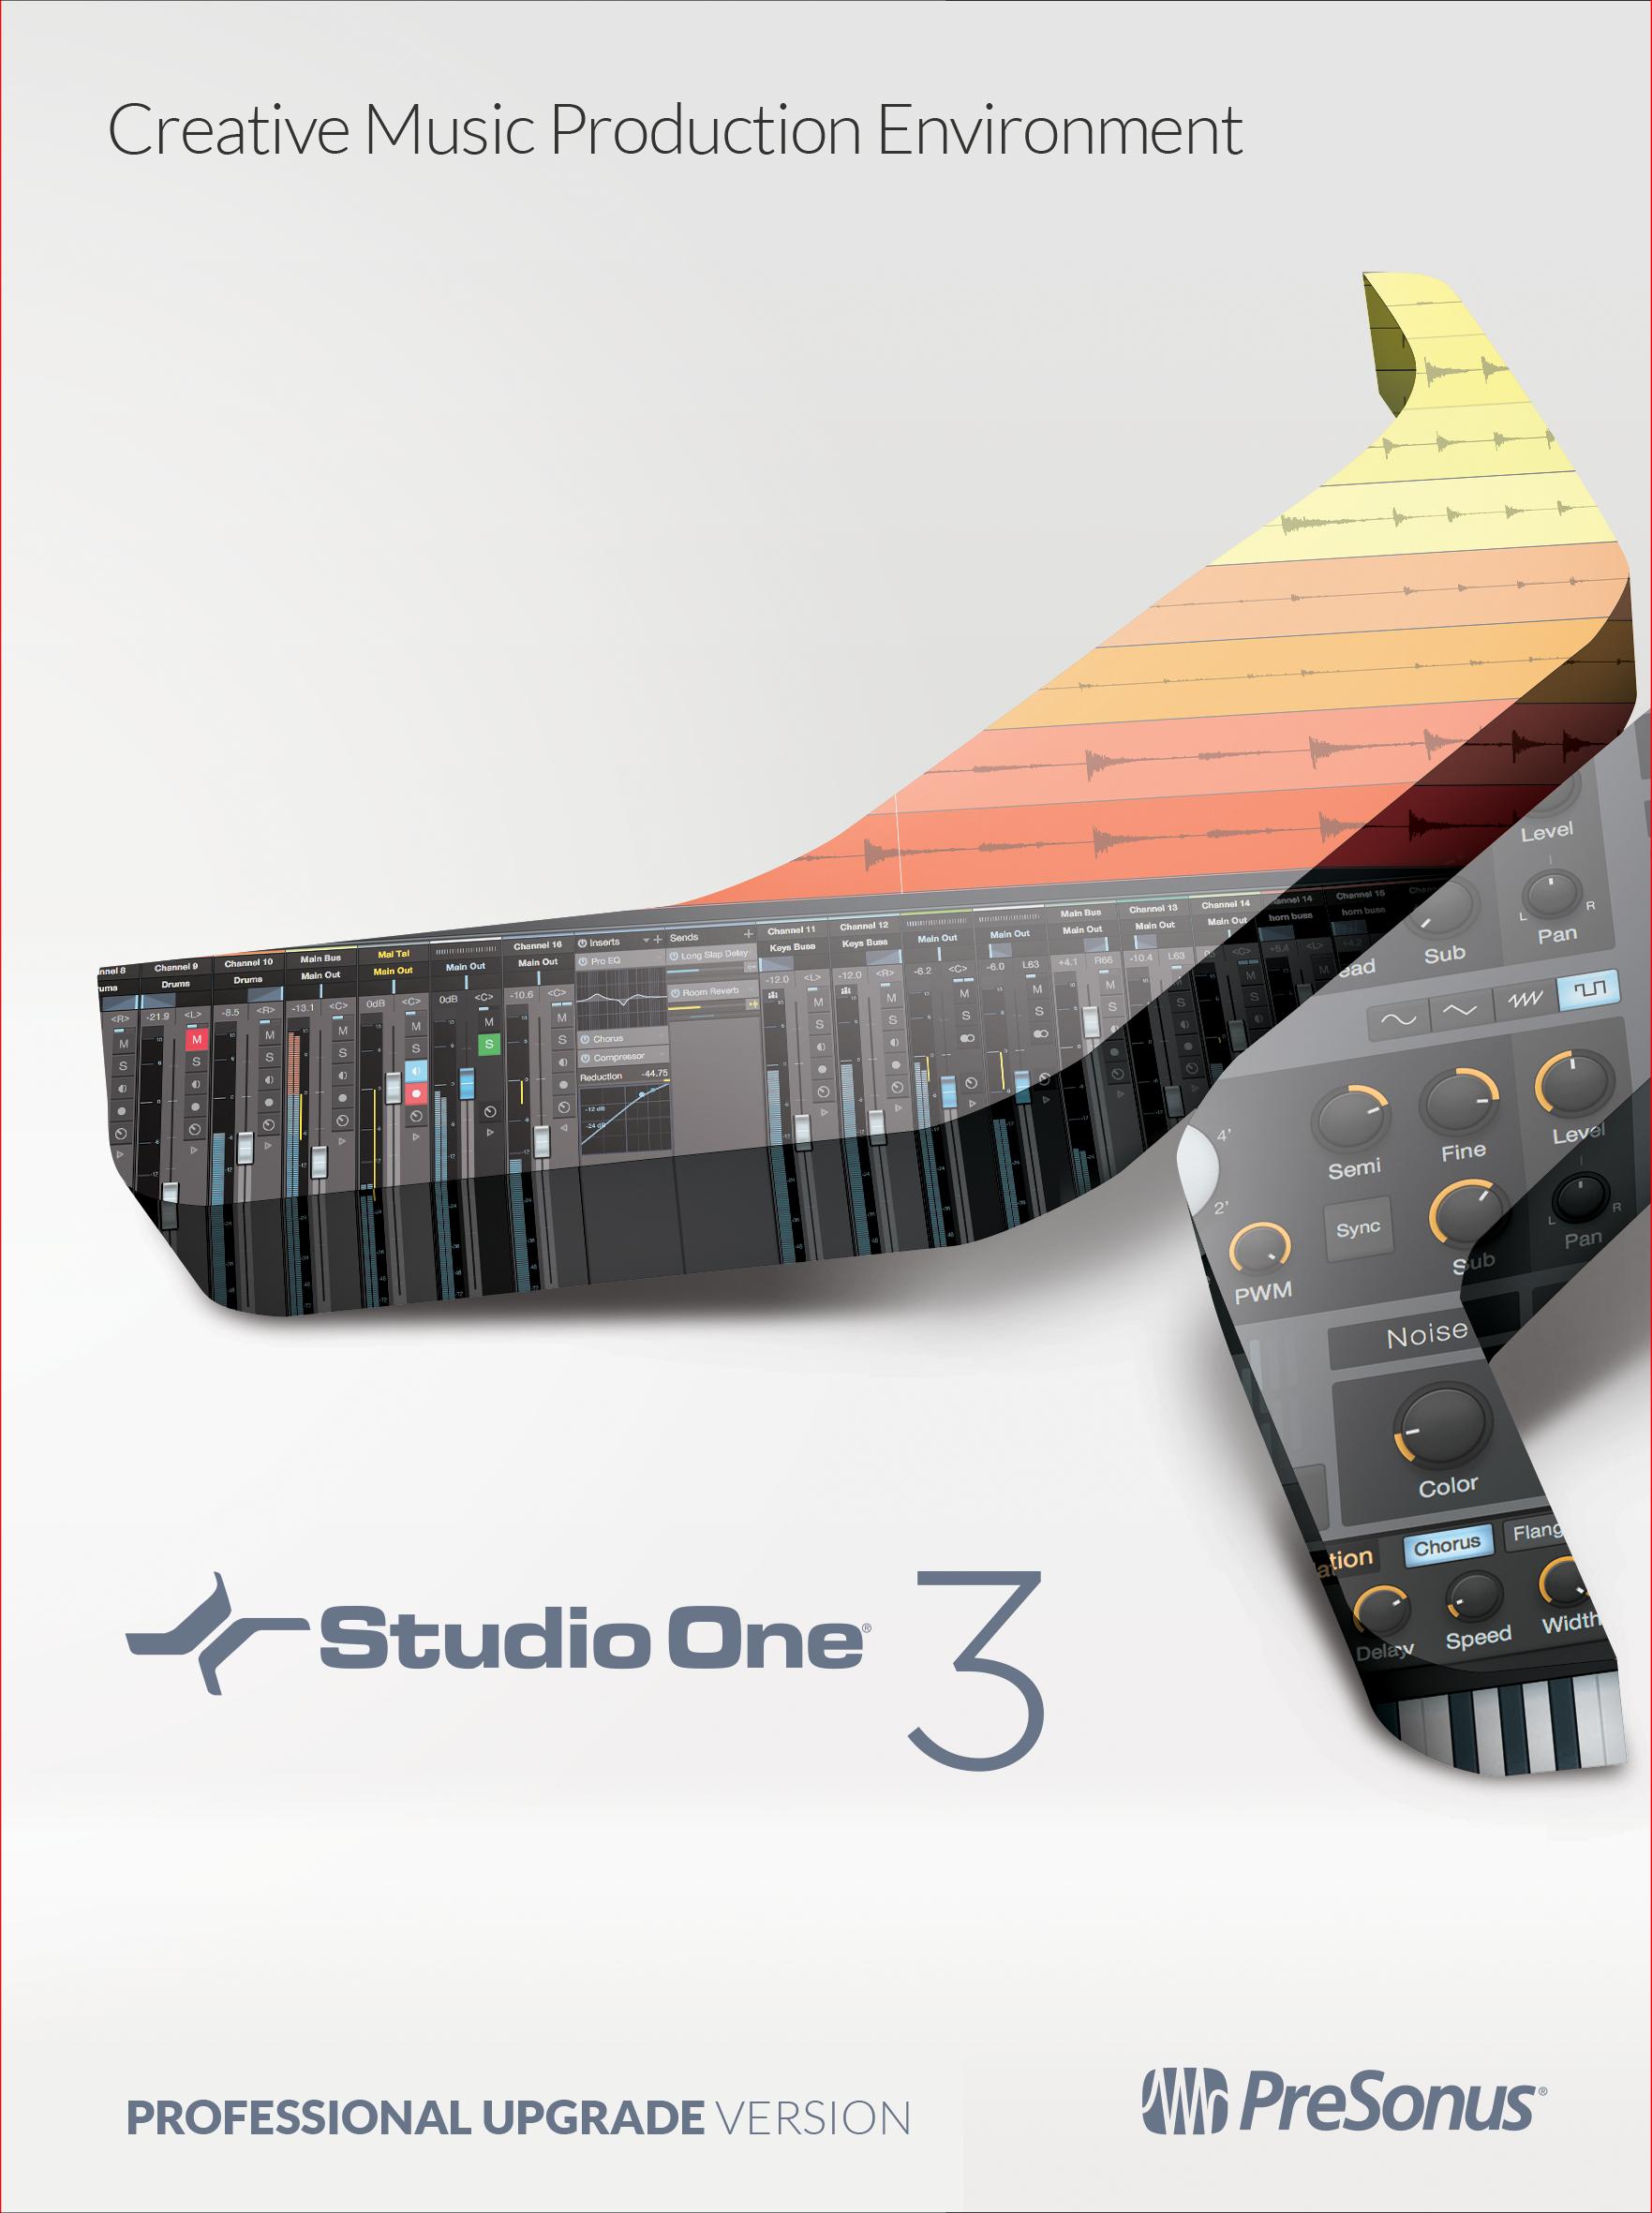 PreSonus Studio One Professional 1 or 2 to Studio One 3 Professional Upgrade (Online Product Key) [Online Code] (Digital Performer 7 Software)